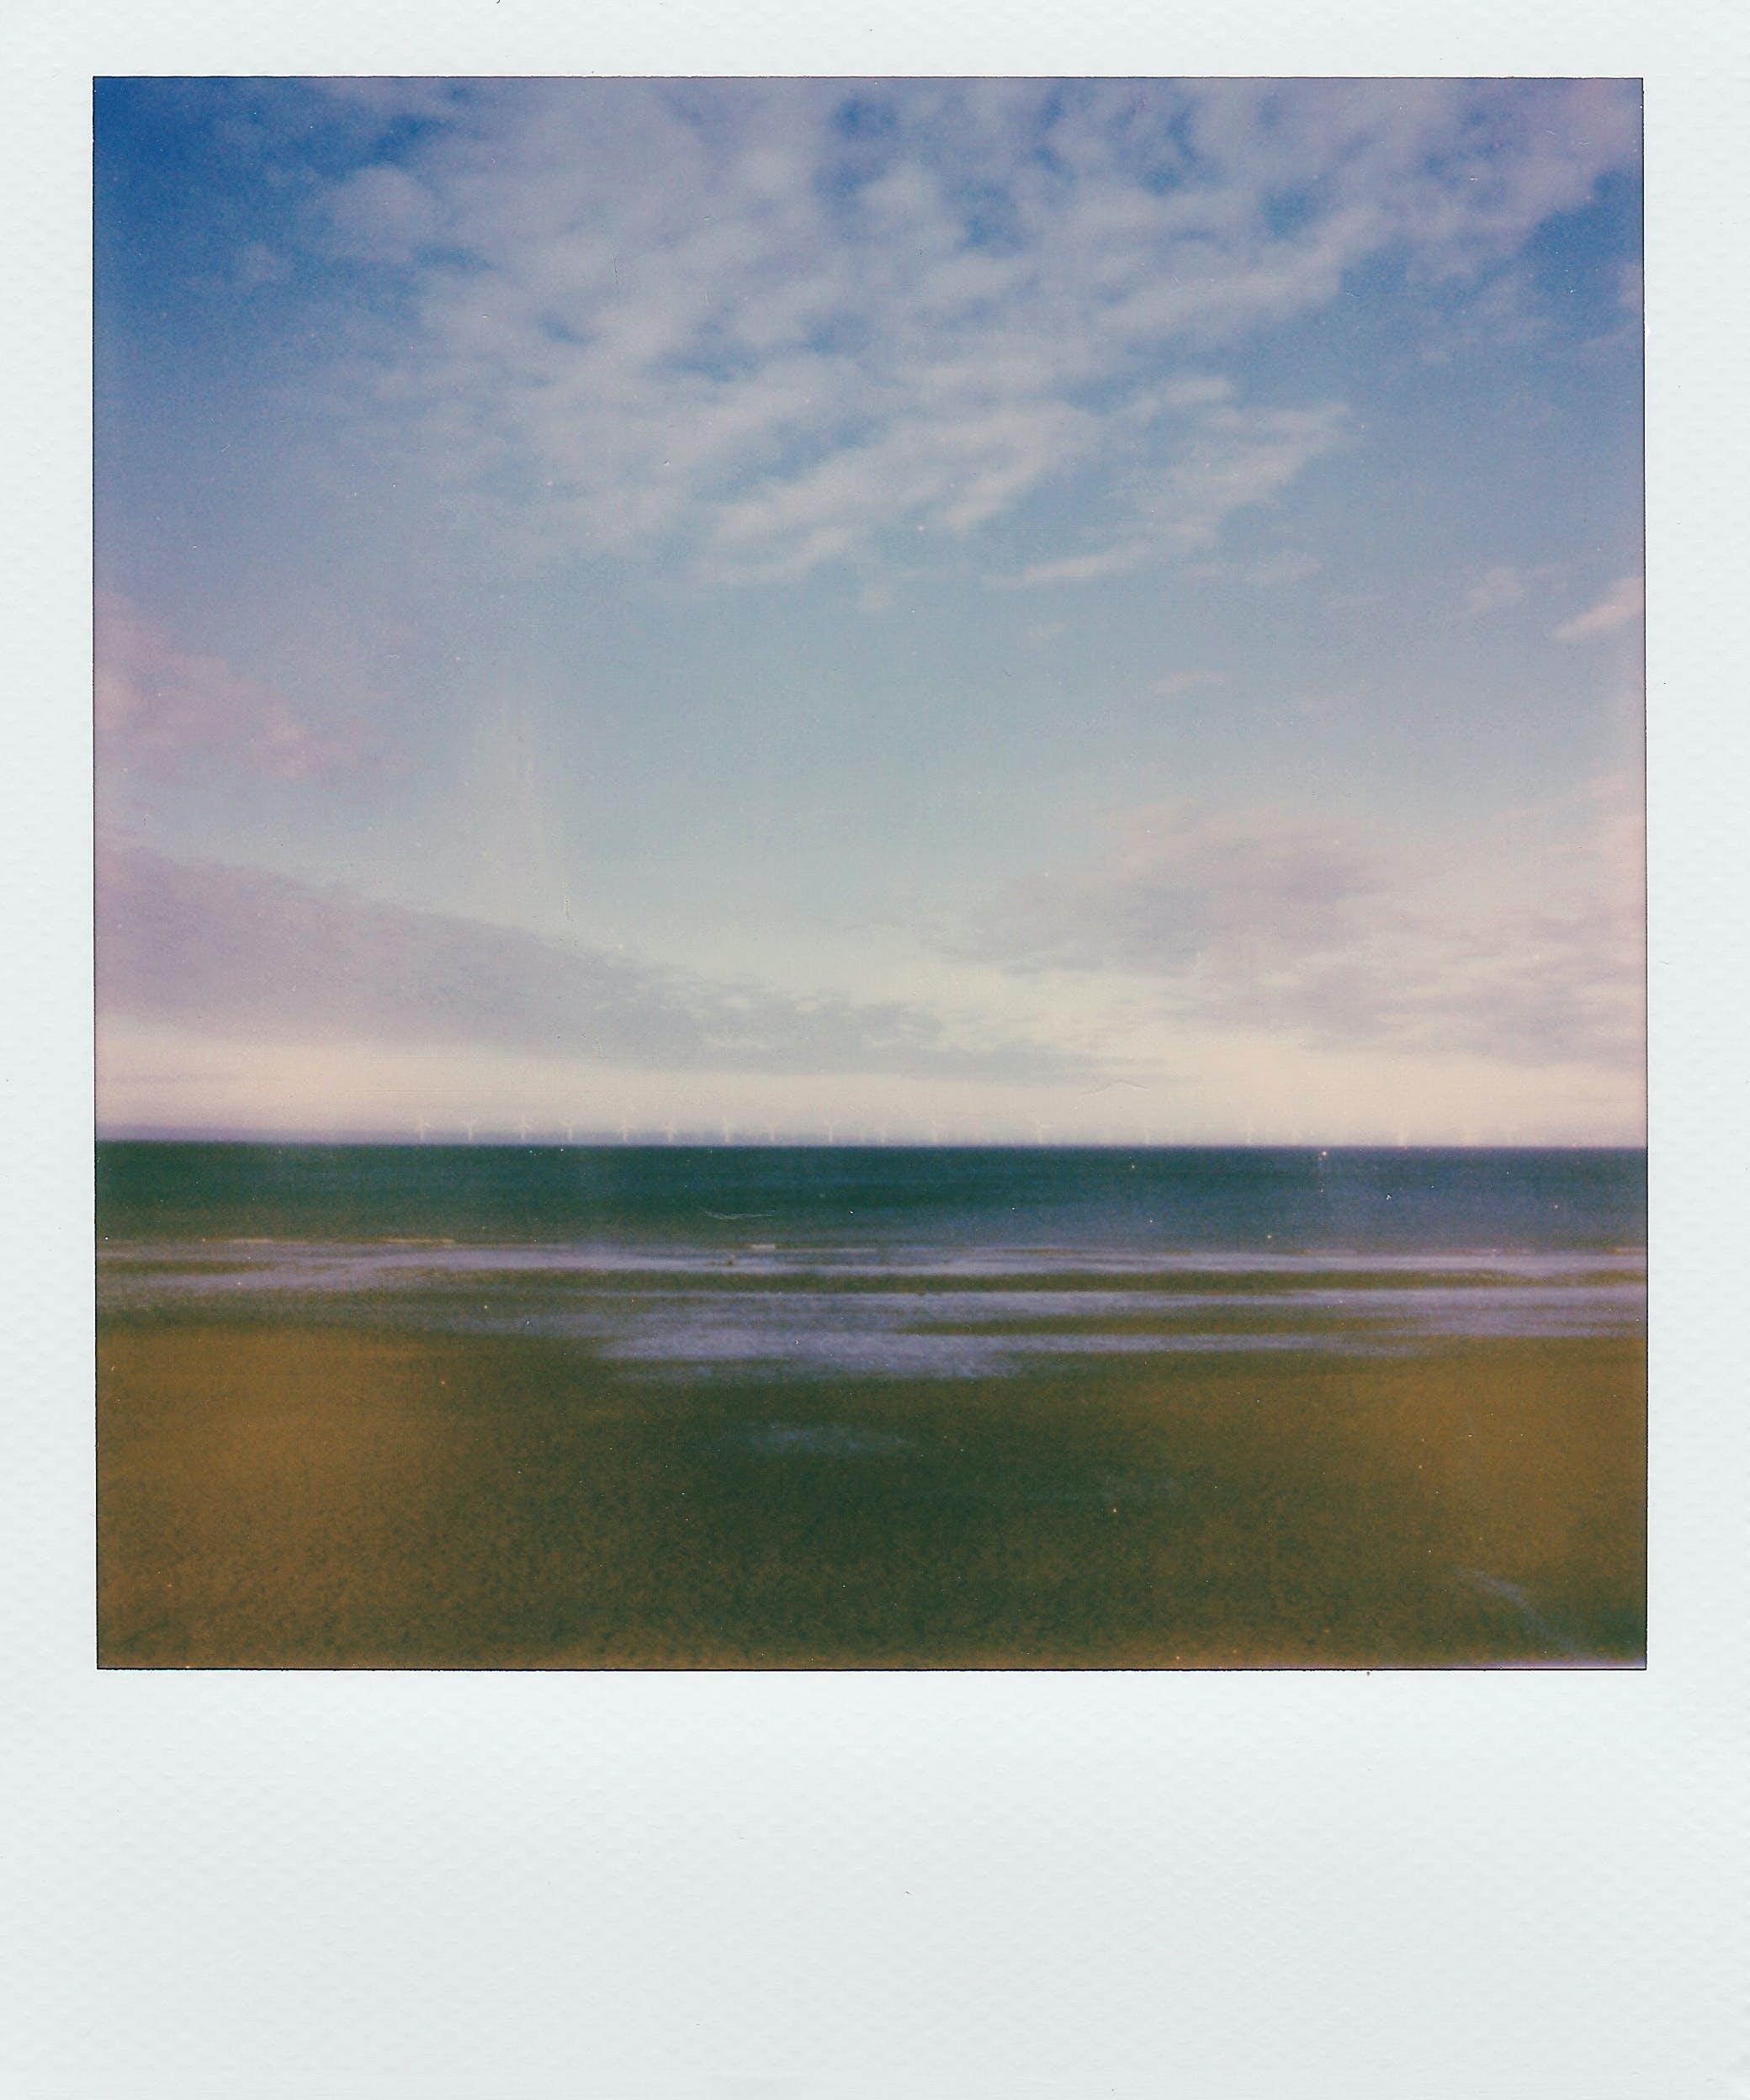 beach, clouds, daylight